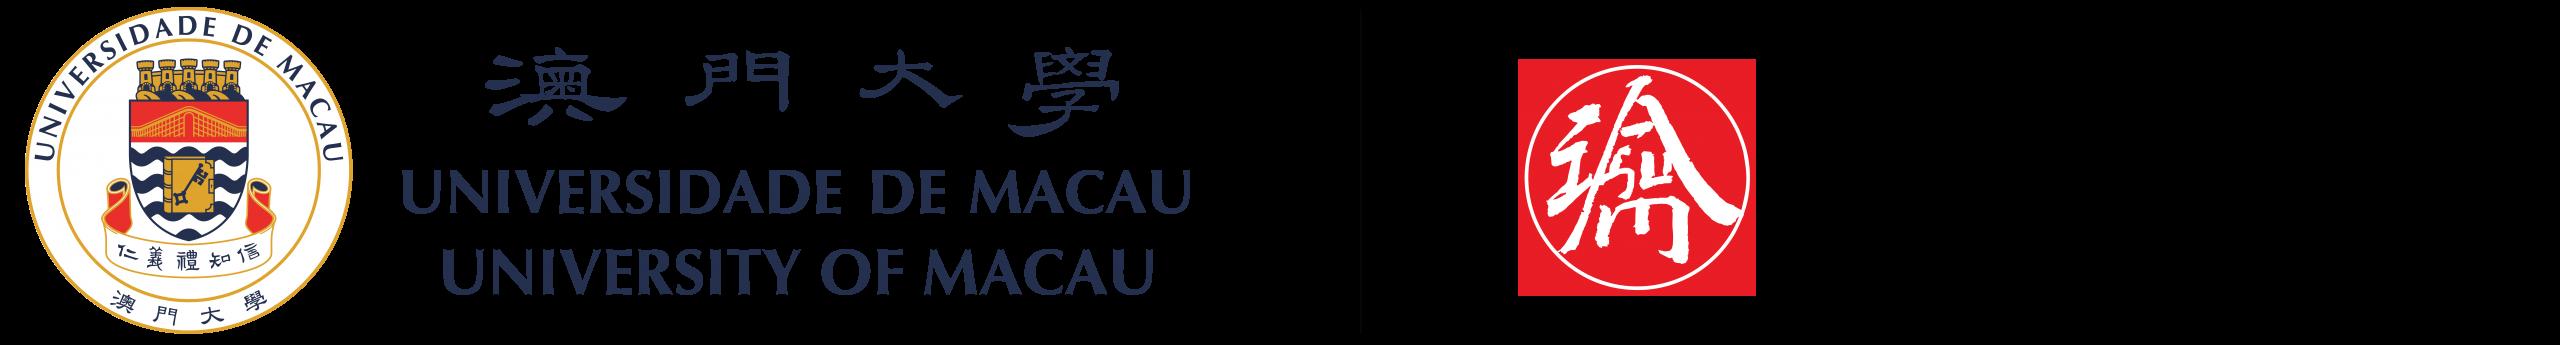 Institute of Advanced Studies in Humanities and Social Sciences | University of Macau Logo